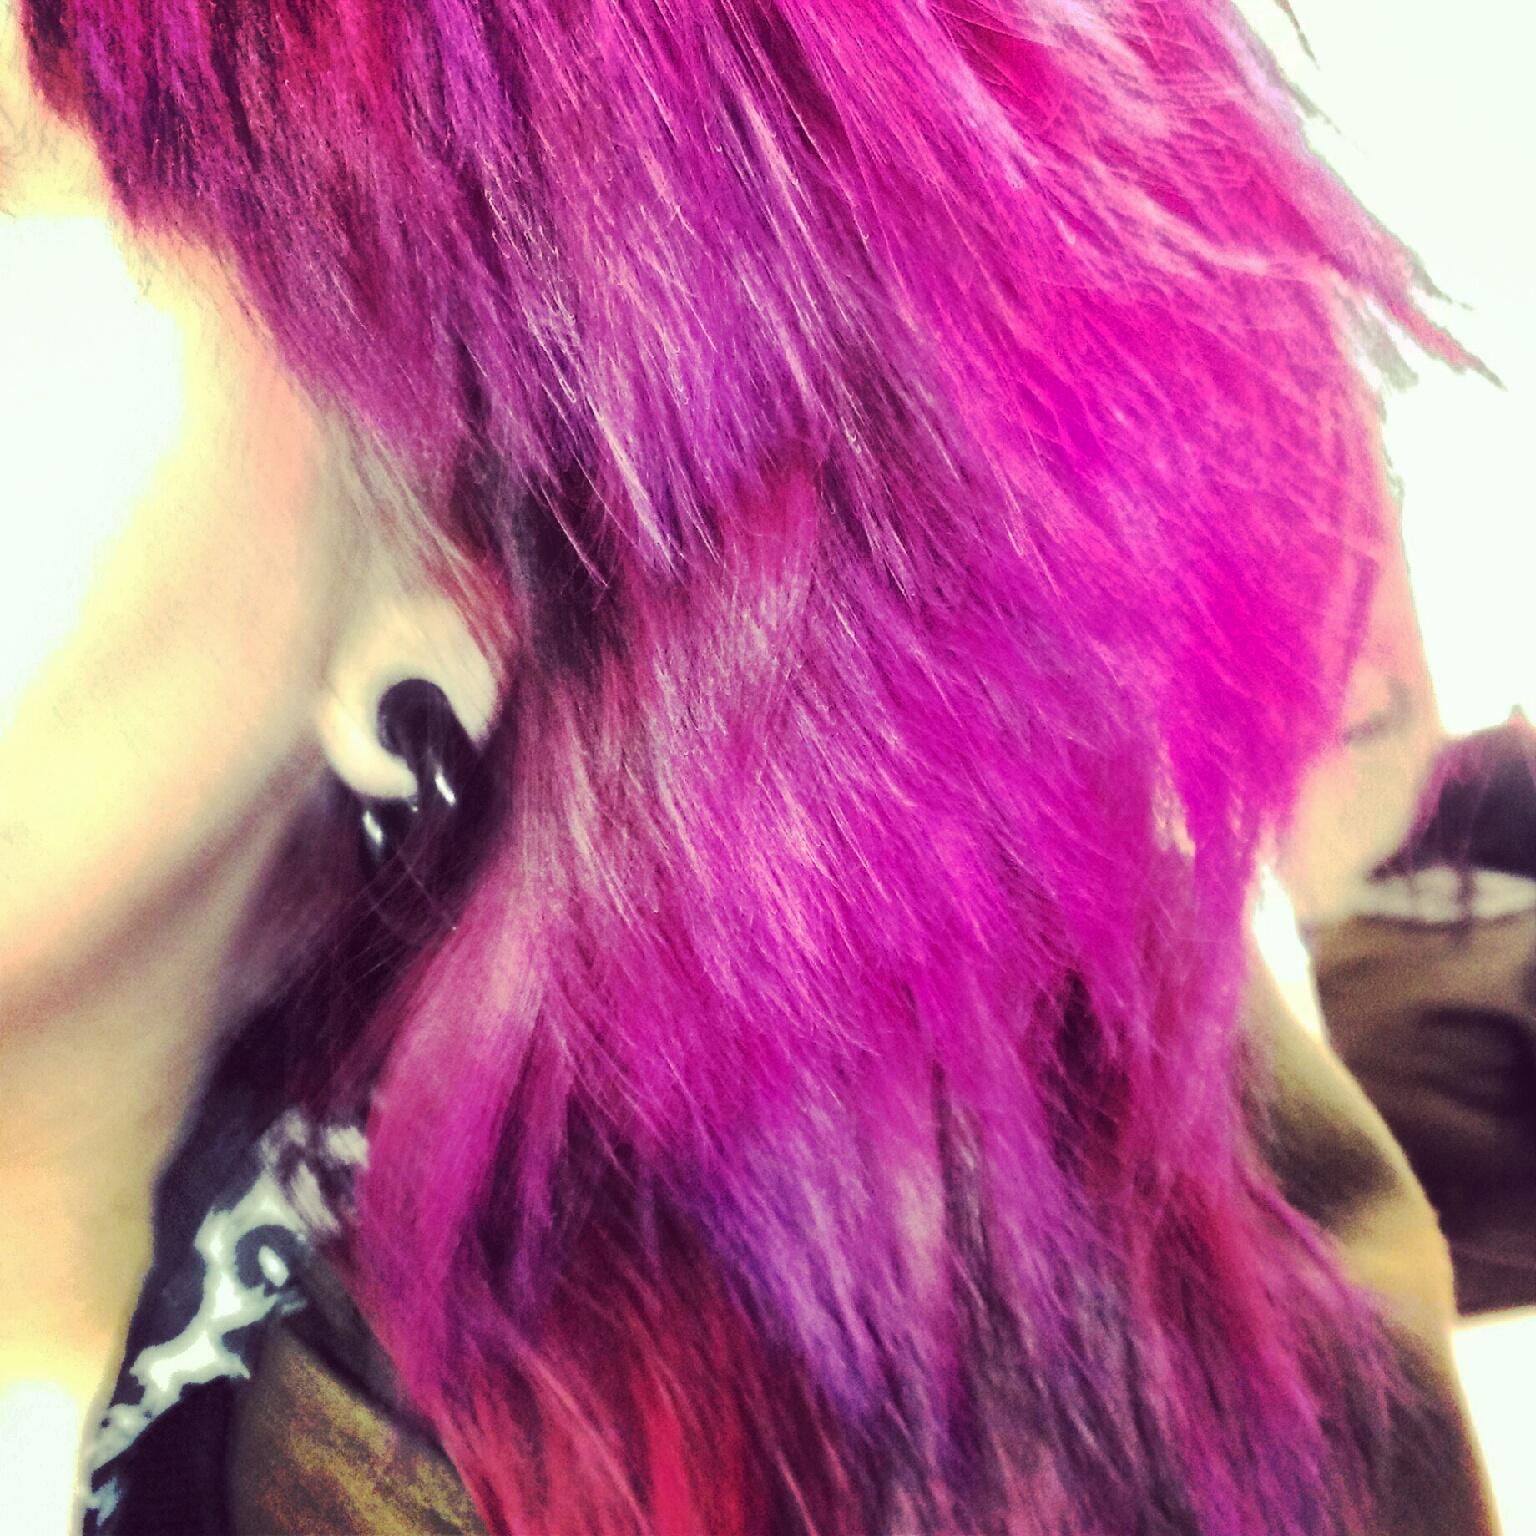 John Frieda Purple Shampoo KatSick: John Frieda: ...